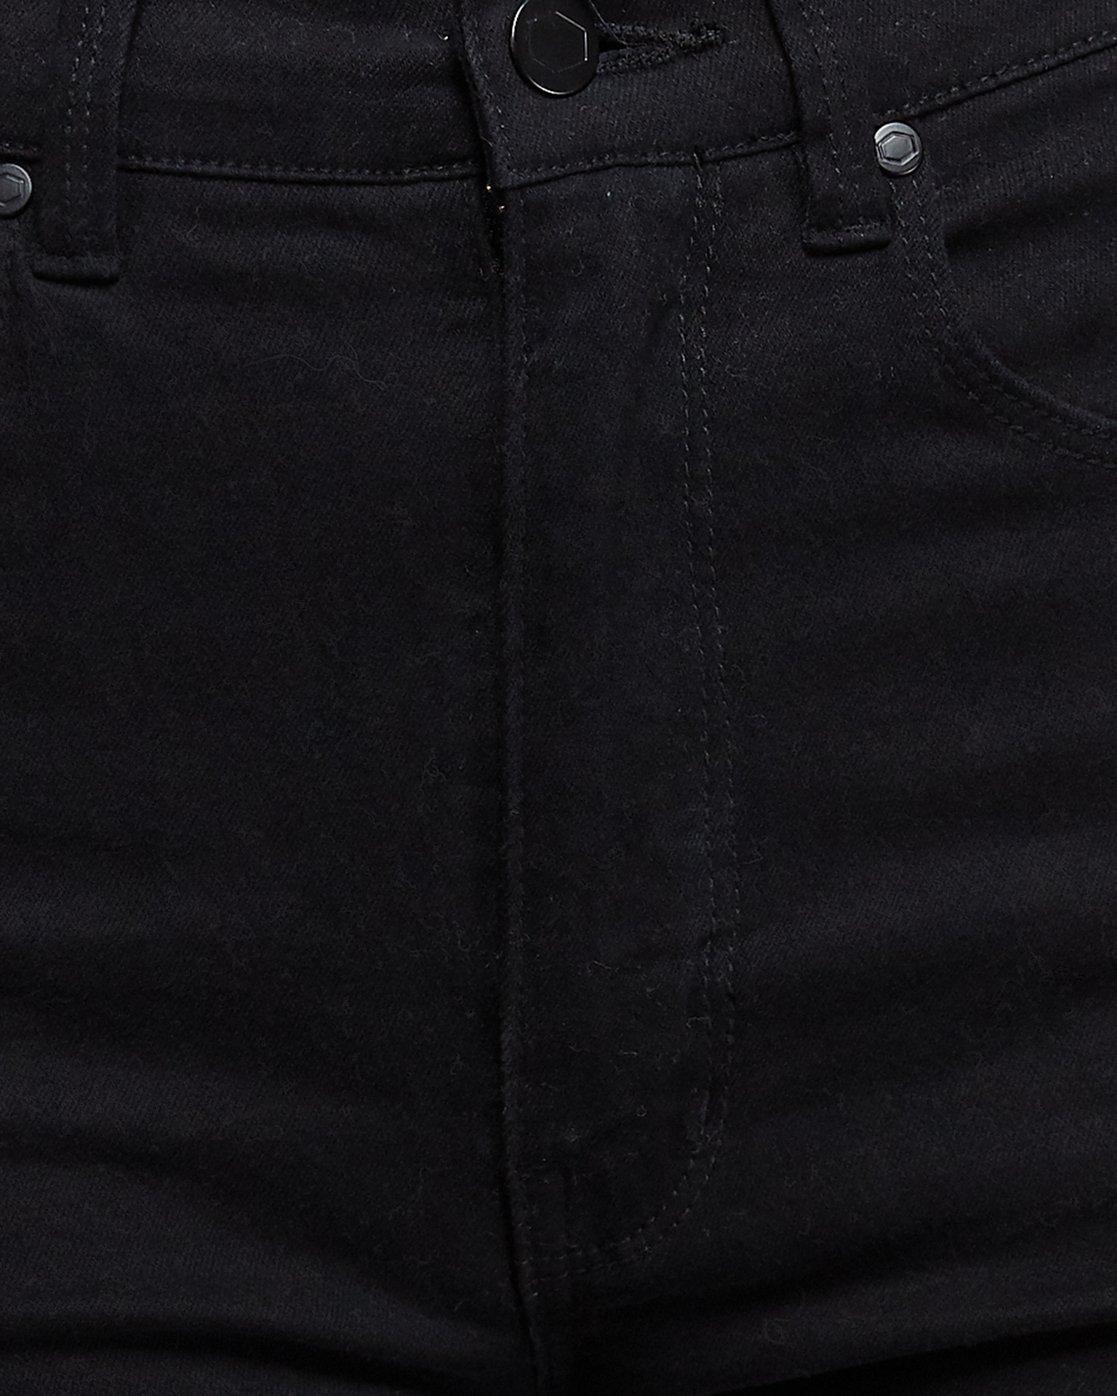 6 Solar Pants - Black Black  R283229 RVCA